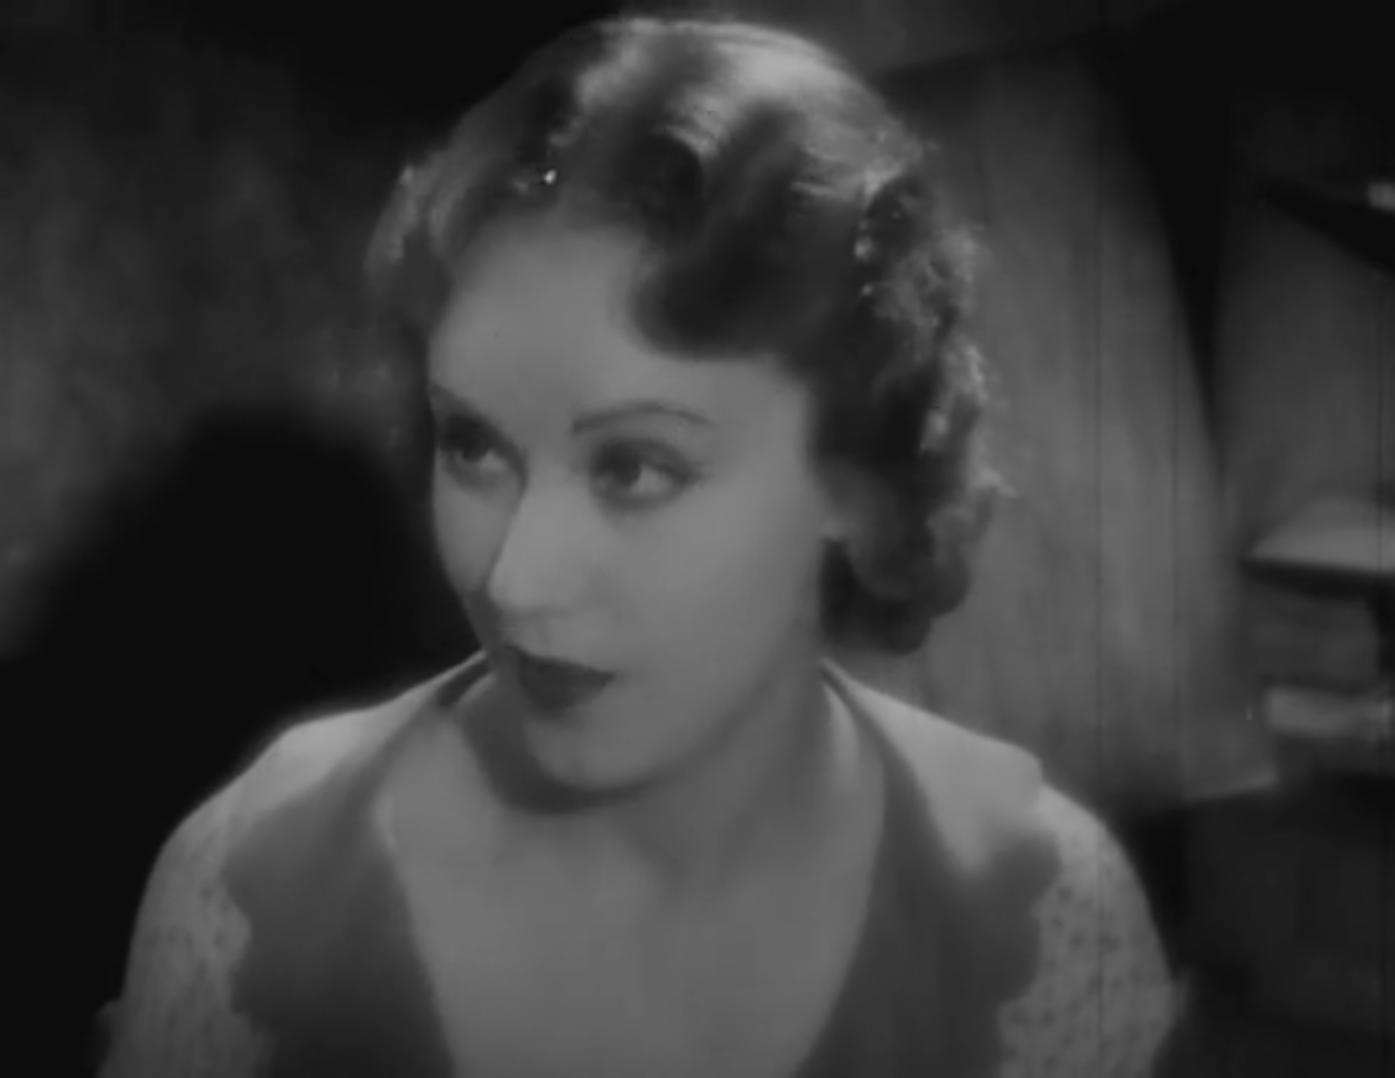 Vivien Leigh (1913?967 (born in Darjeeling, India),Ana Coto Erotic videos Jackie Burroughs,Jamie Gray Hyder